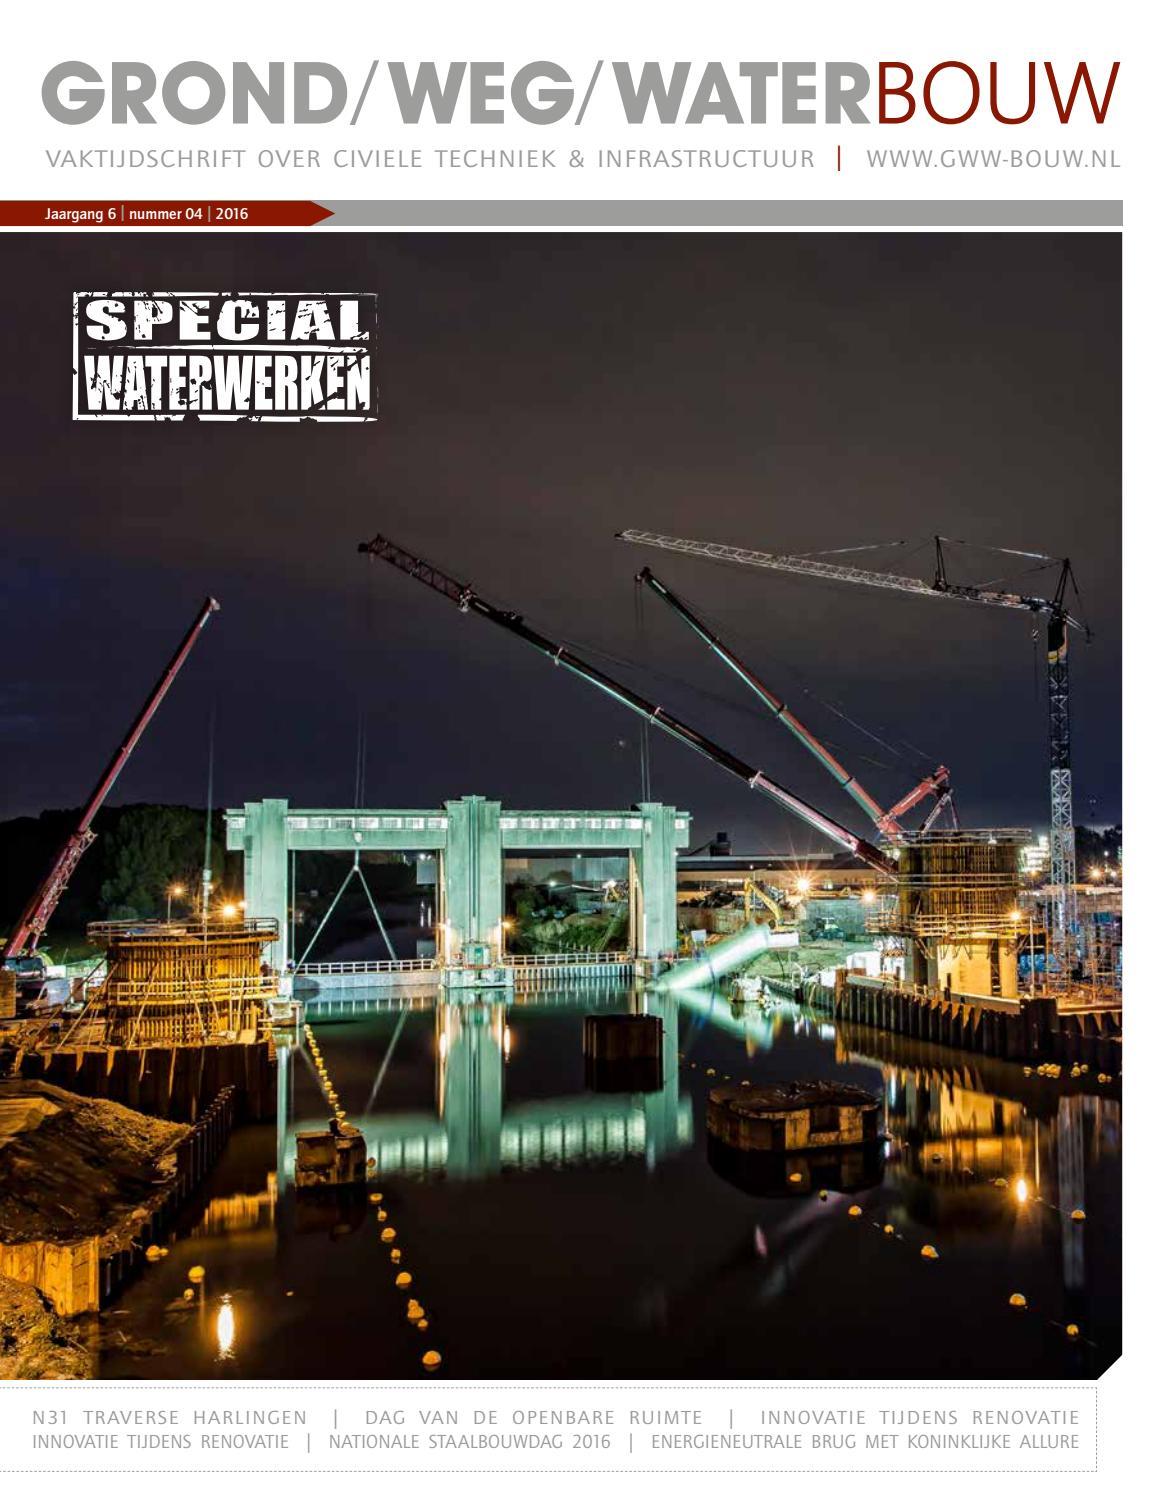 Grond weg waterbouw nl 04 2016 by Louwers Uitgeversorganisatie BV - issuu